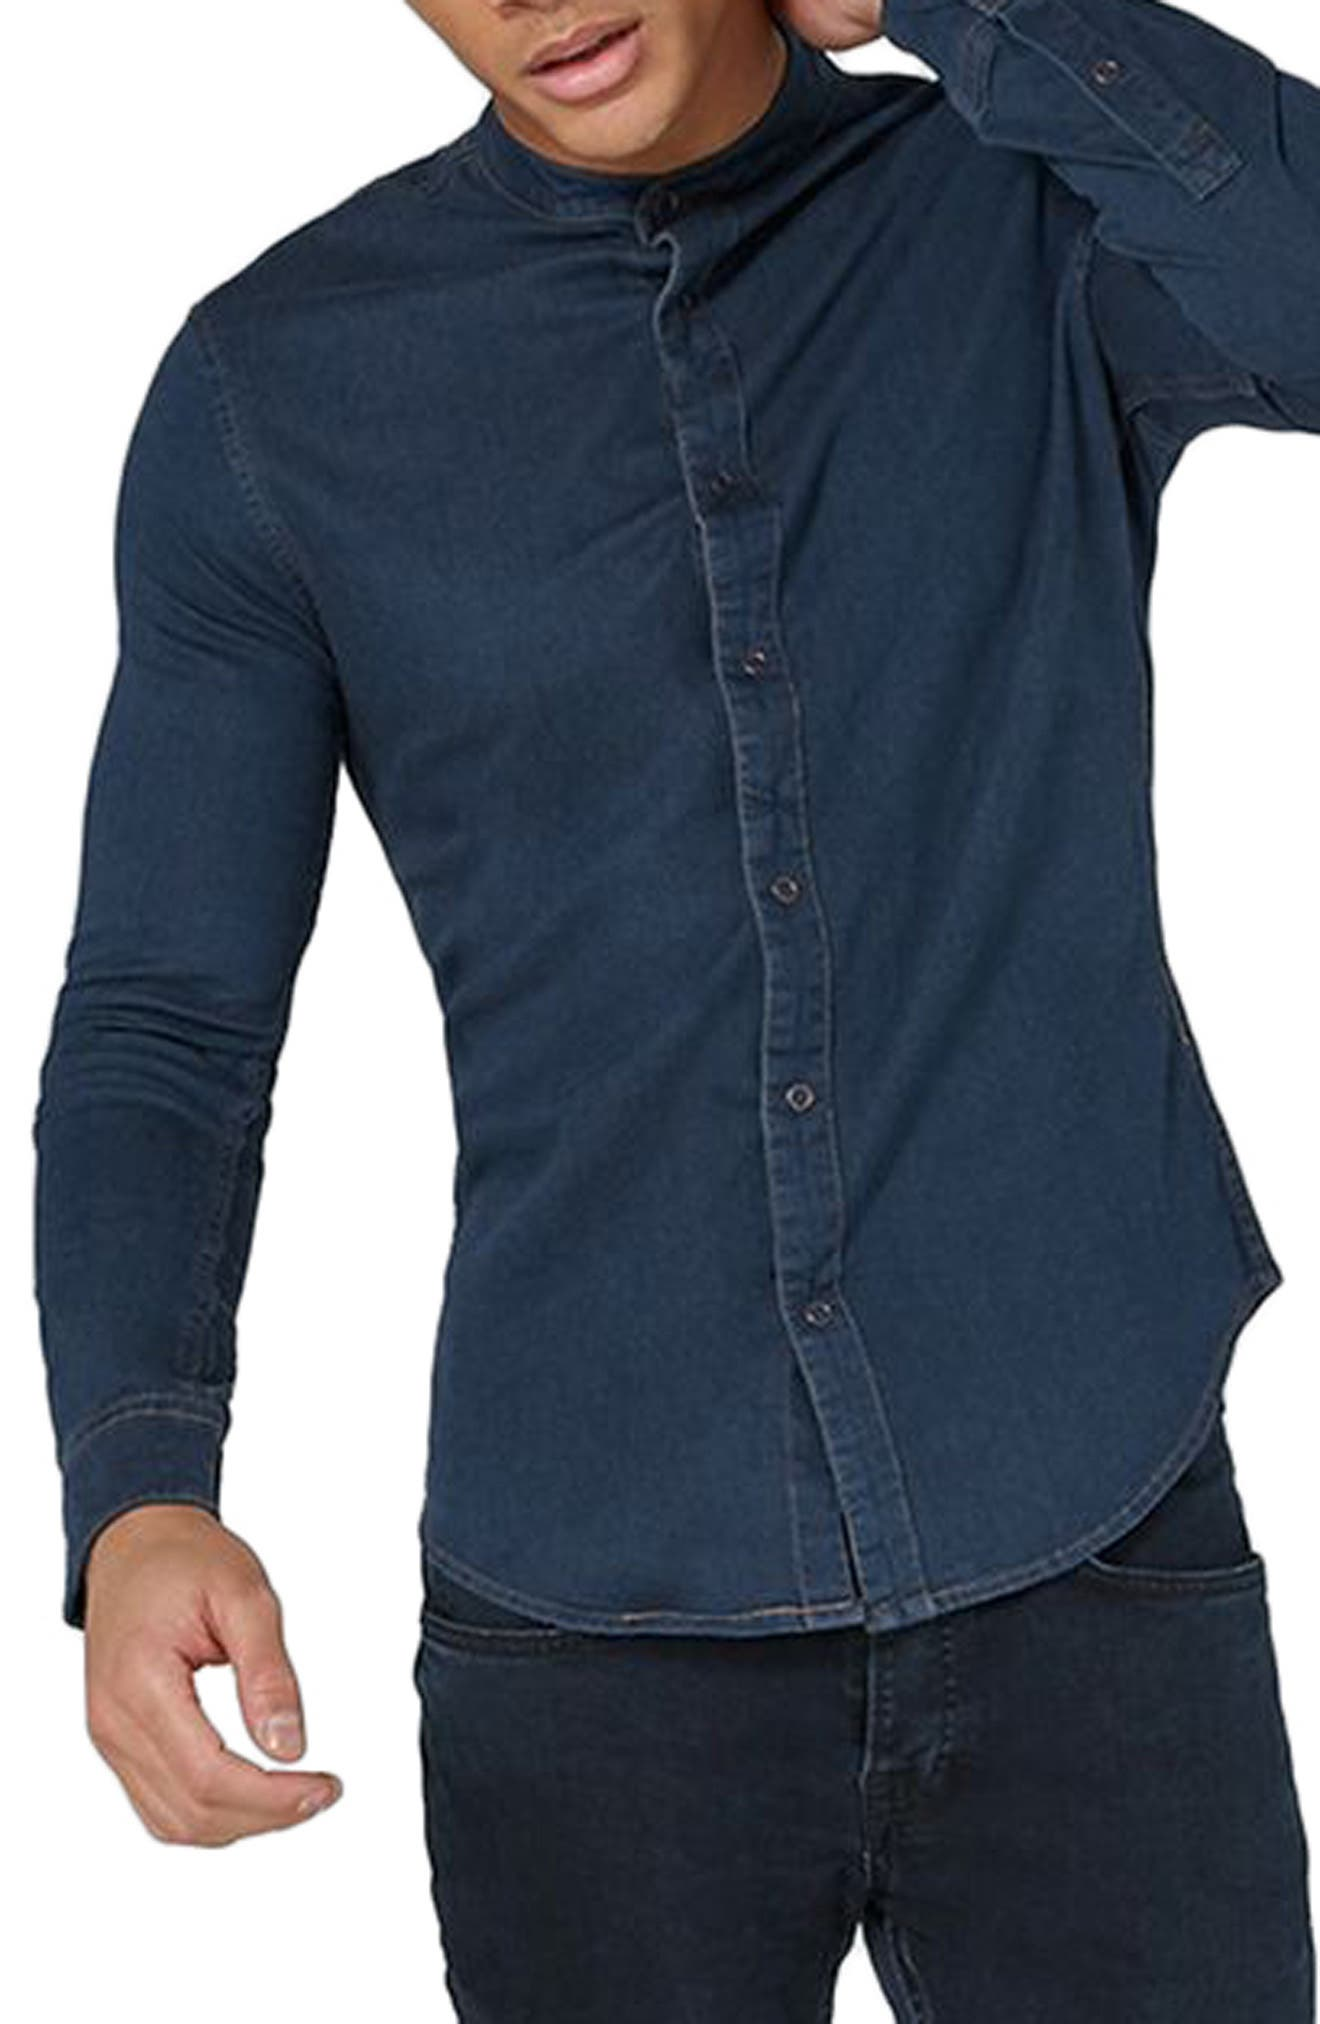 Band Collar Denim Shirt,                         Main,                         color, Blue